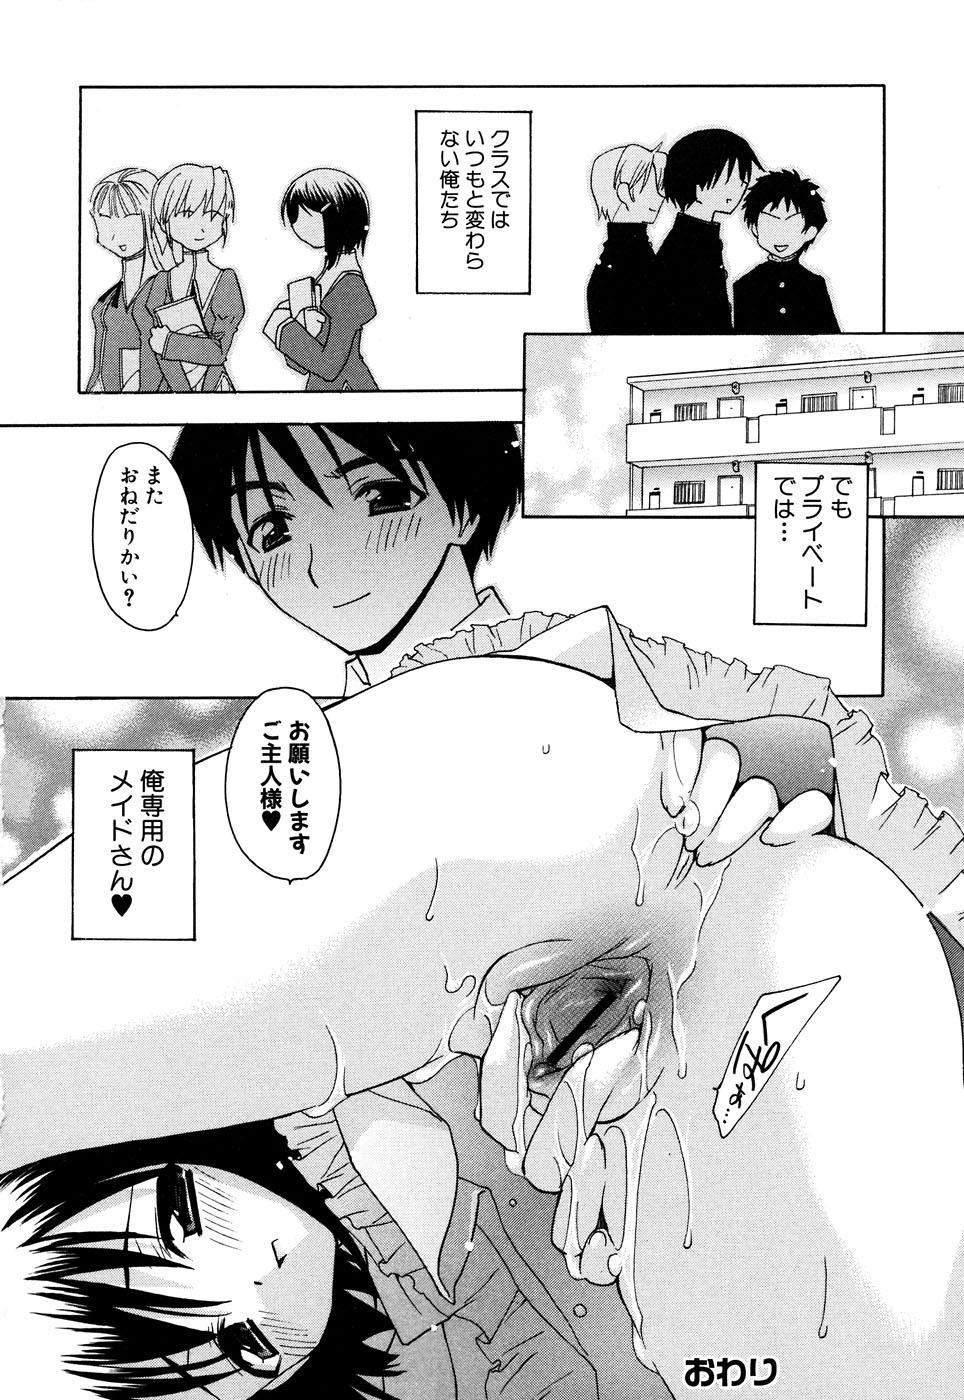 Fechikko VS Series ROUND.2 Miko San VS Maid San 102